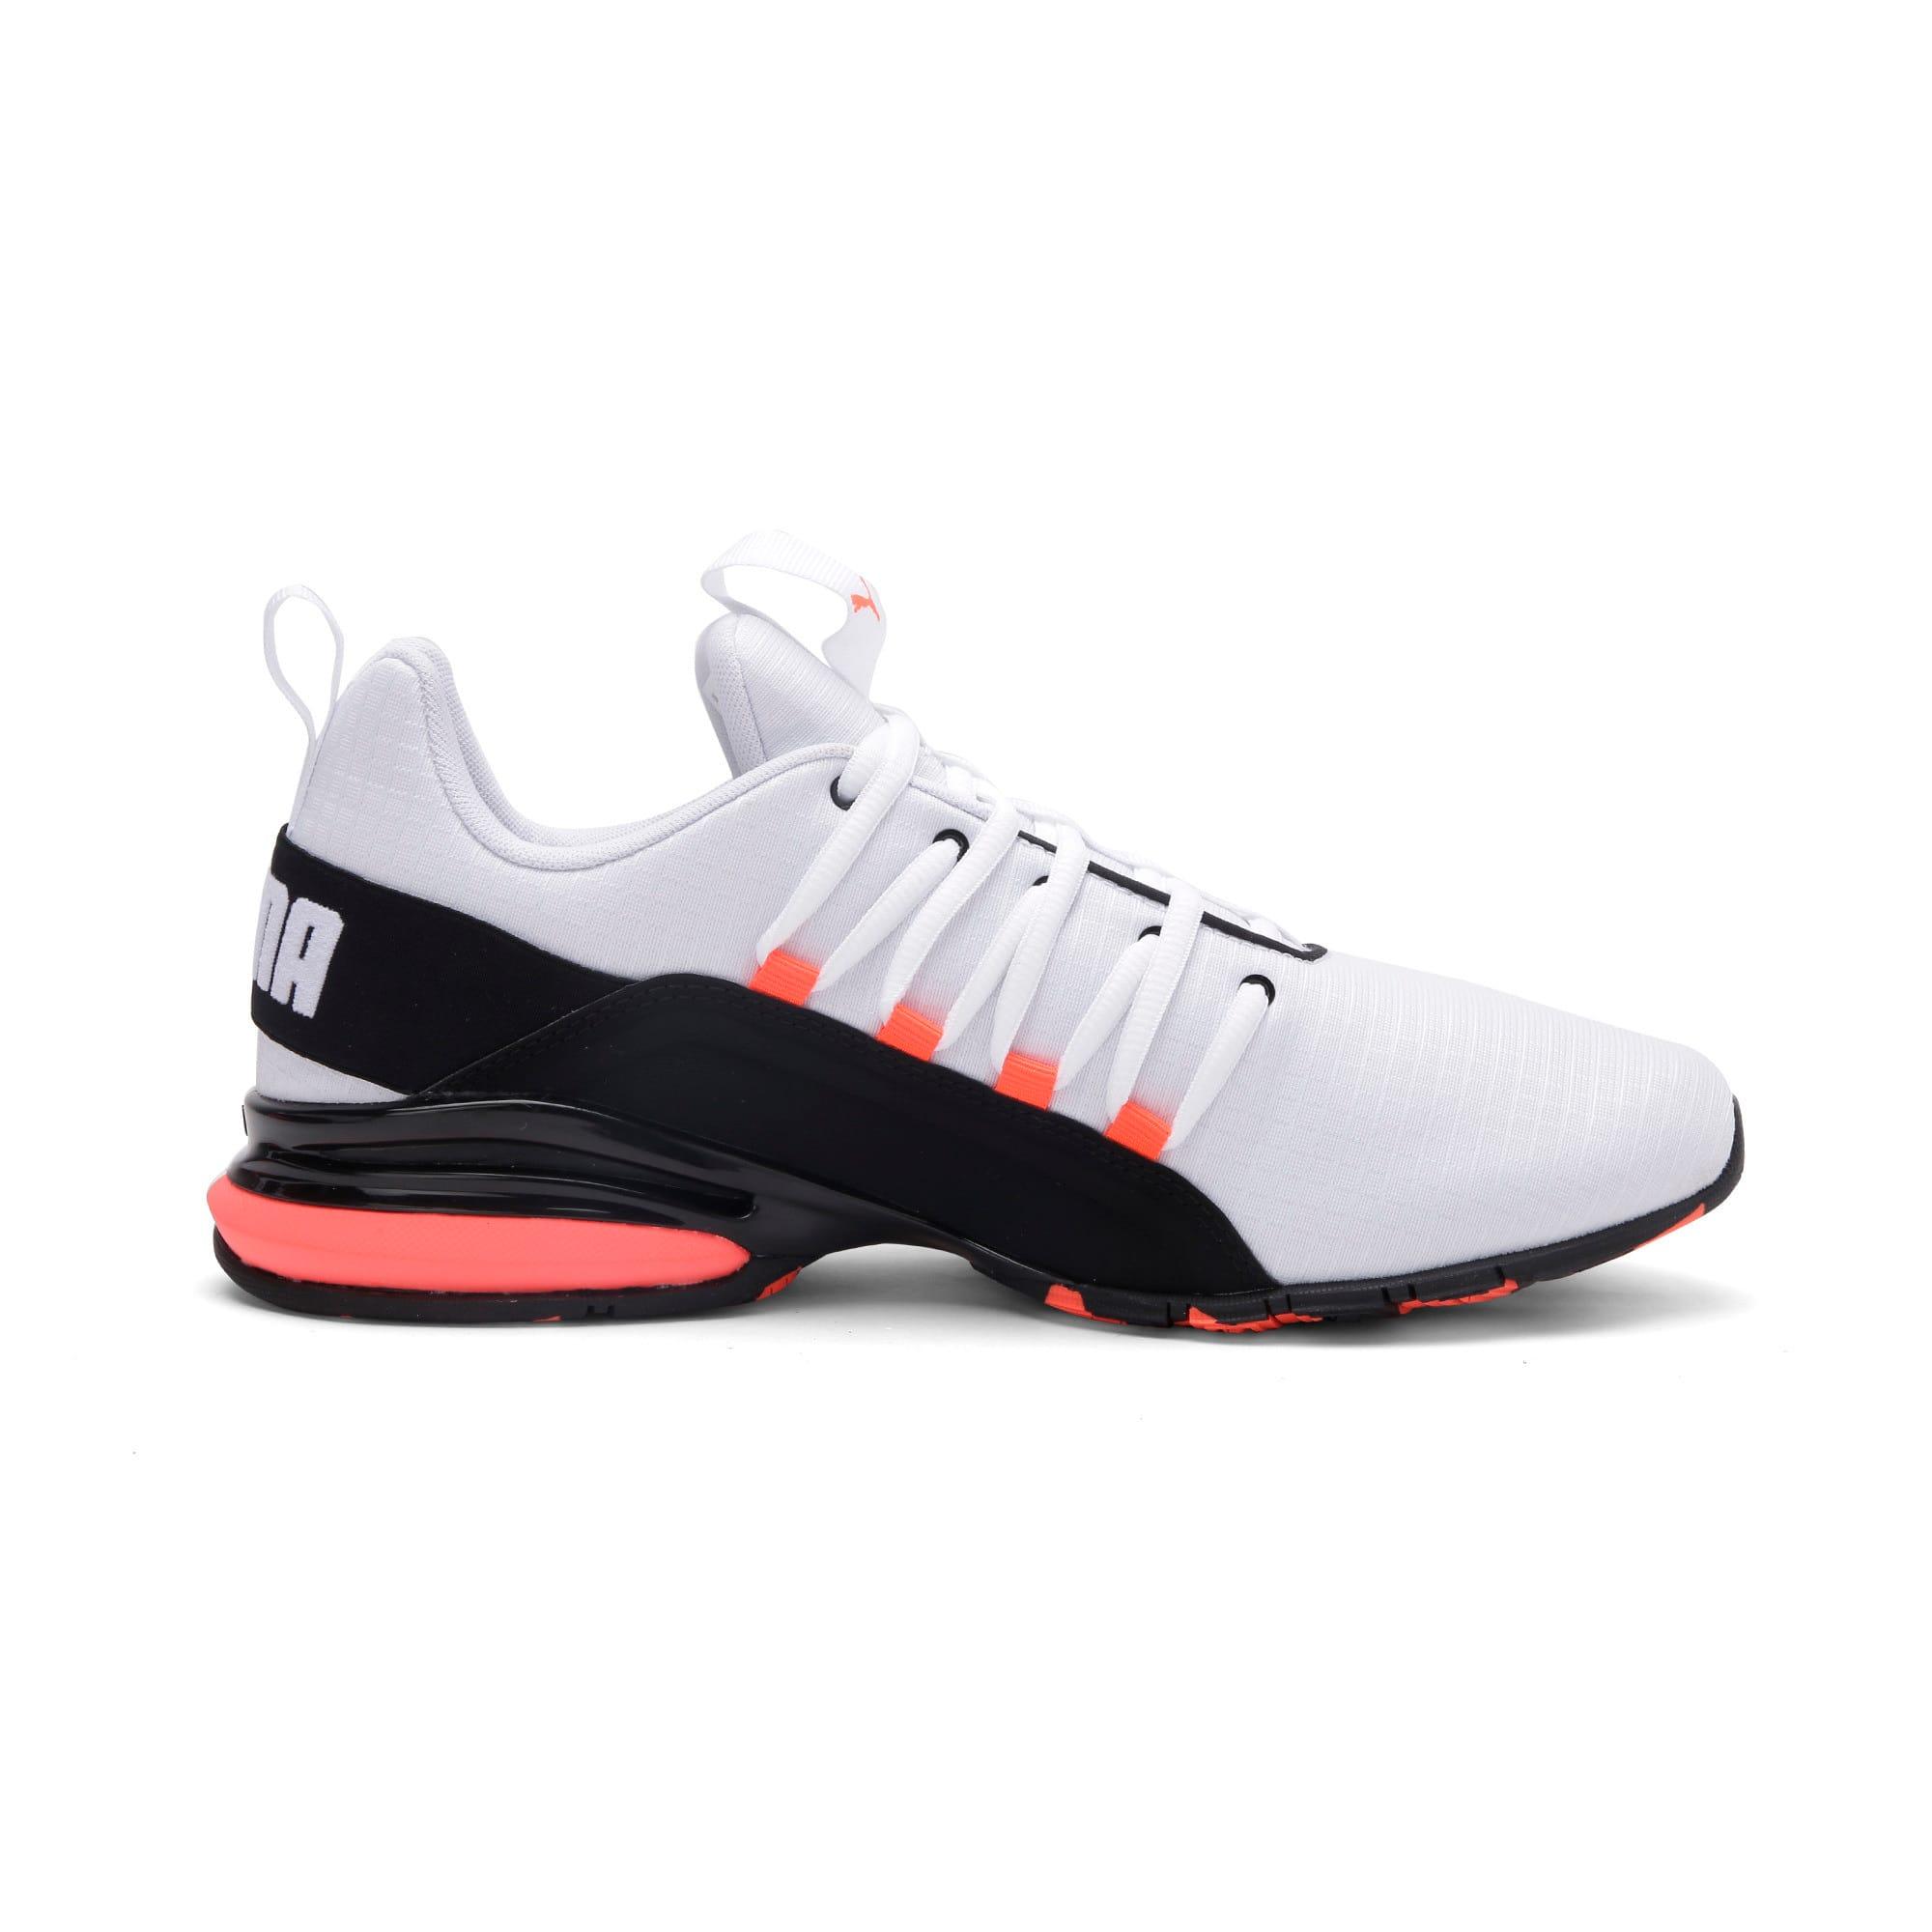 Thumbnail 6 of Axelion Rip Men's Training Shoes, White-Black-Nrgy Red, medium